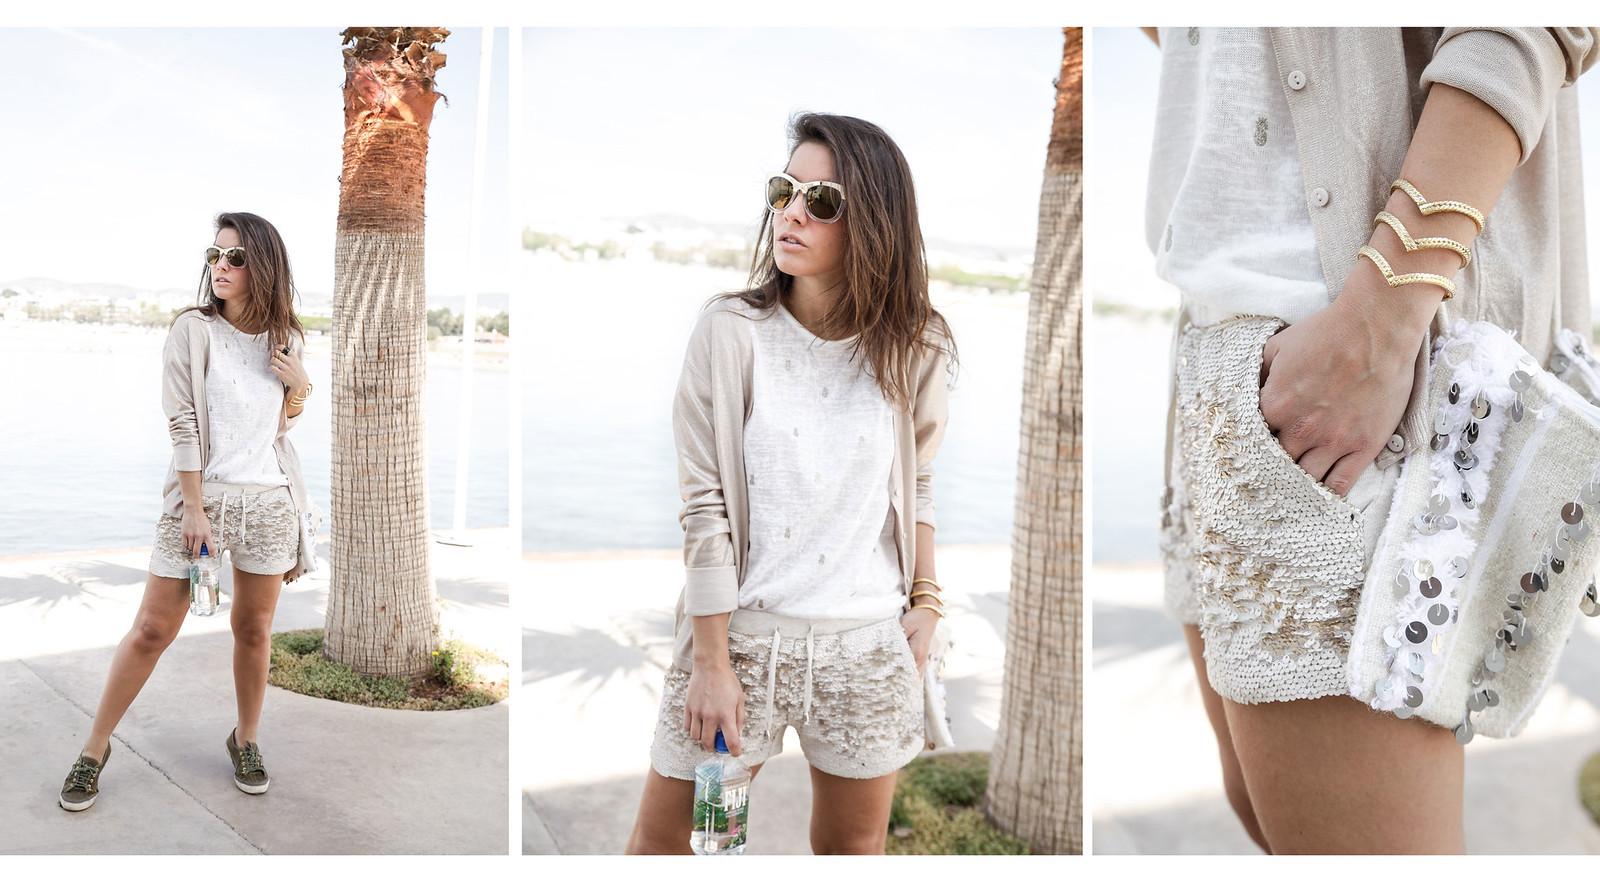 07_Shorts_lentejuelas_dorados_outfit_lelyjane_gold_shorts_theguetsgirl_laura_santolaria_influencer_barcelona_style